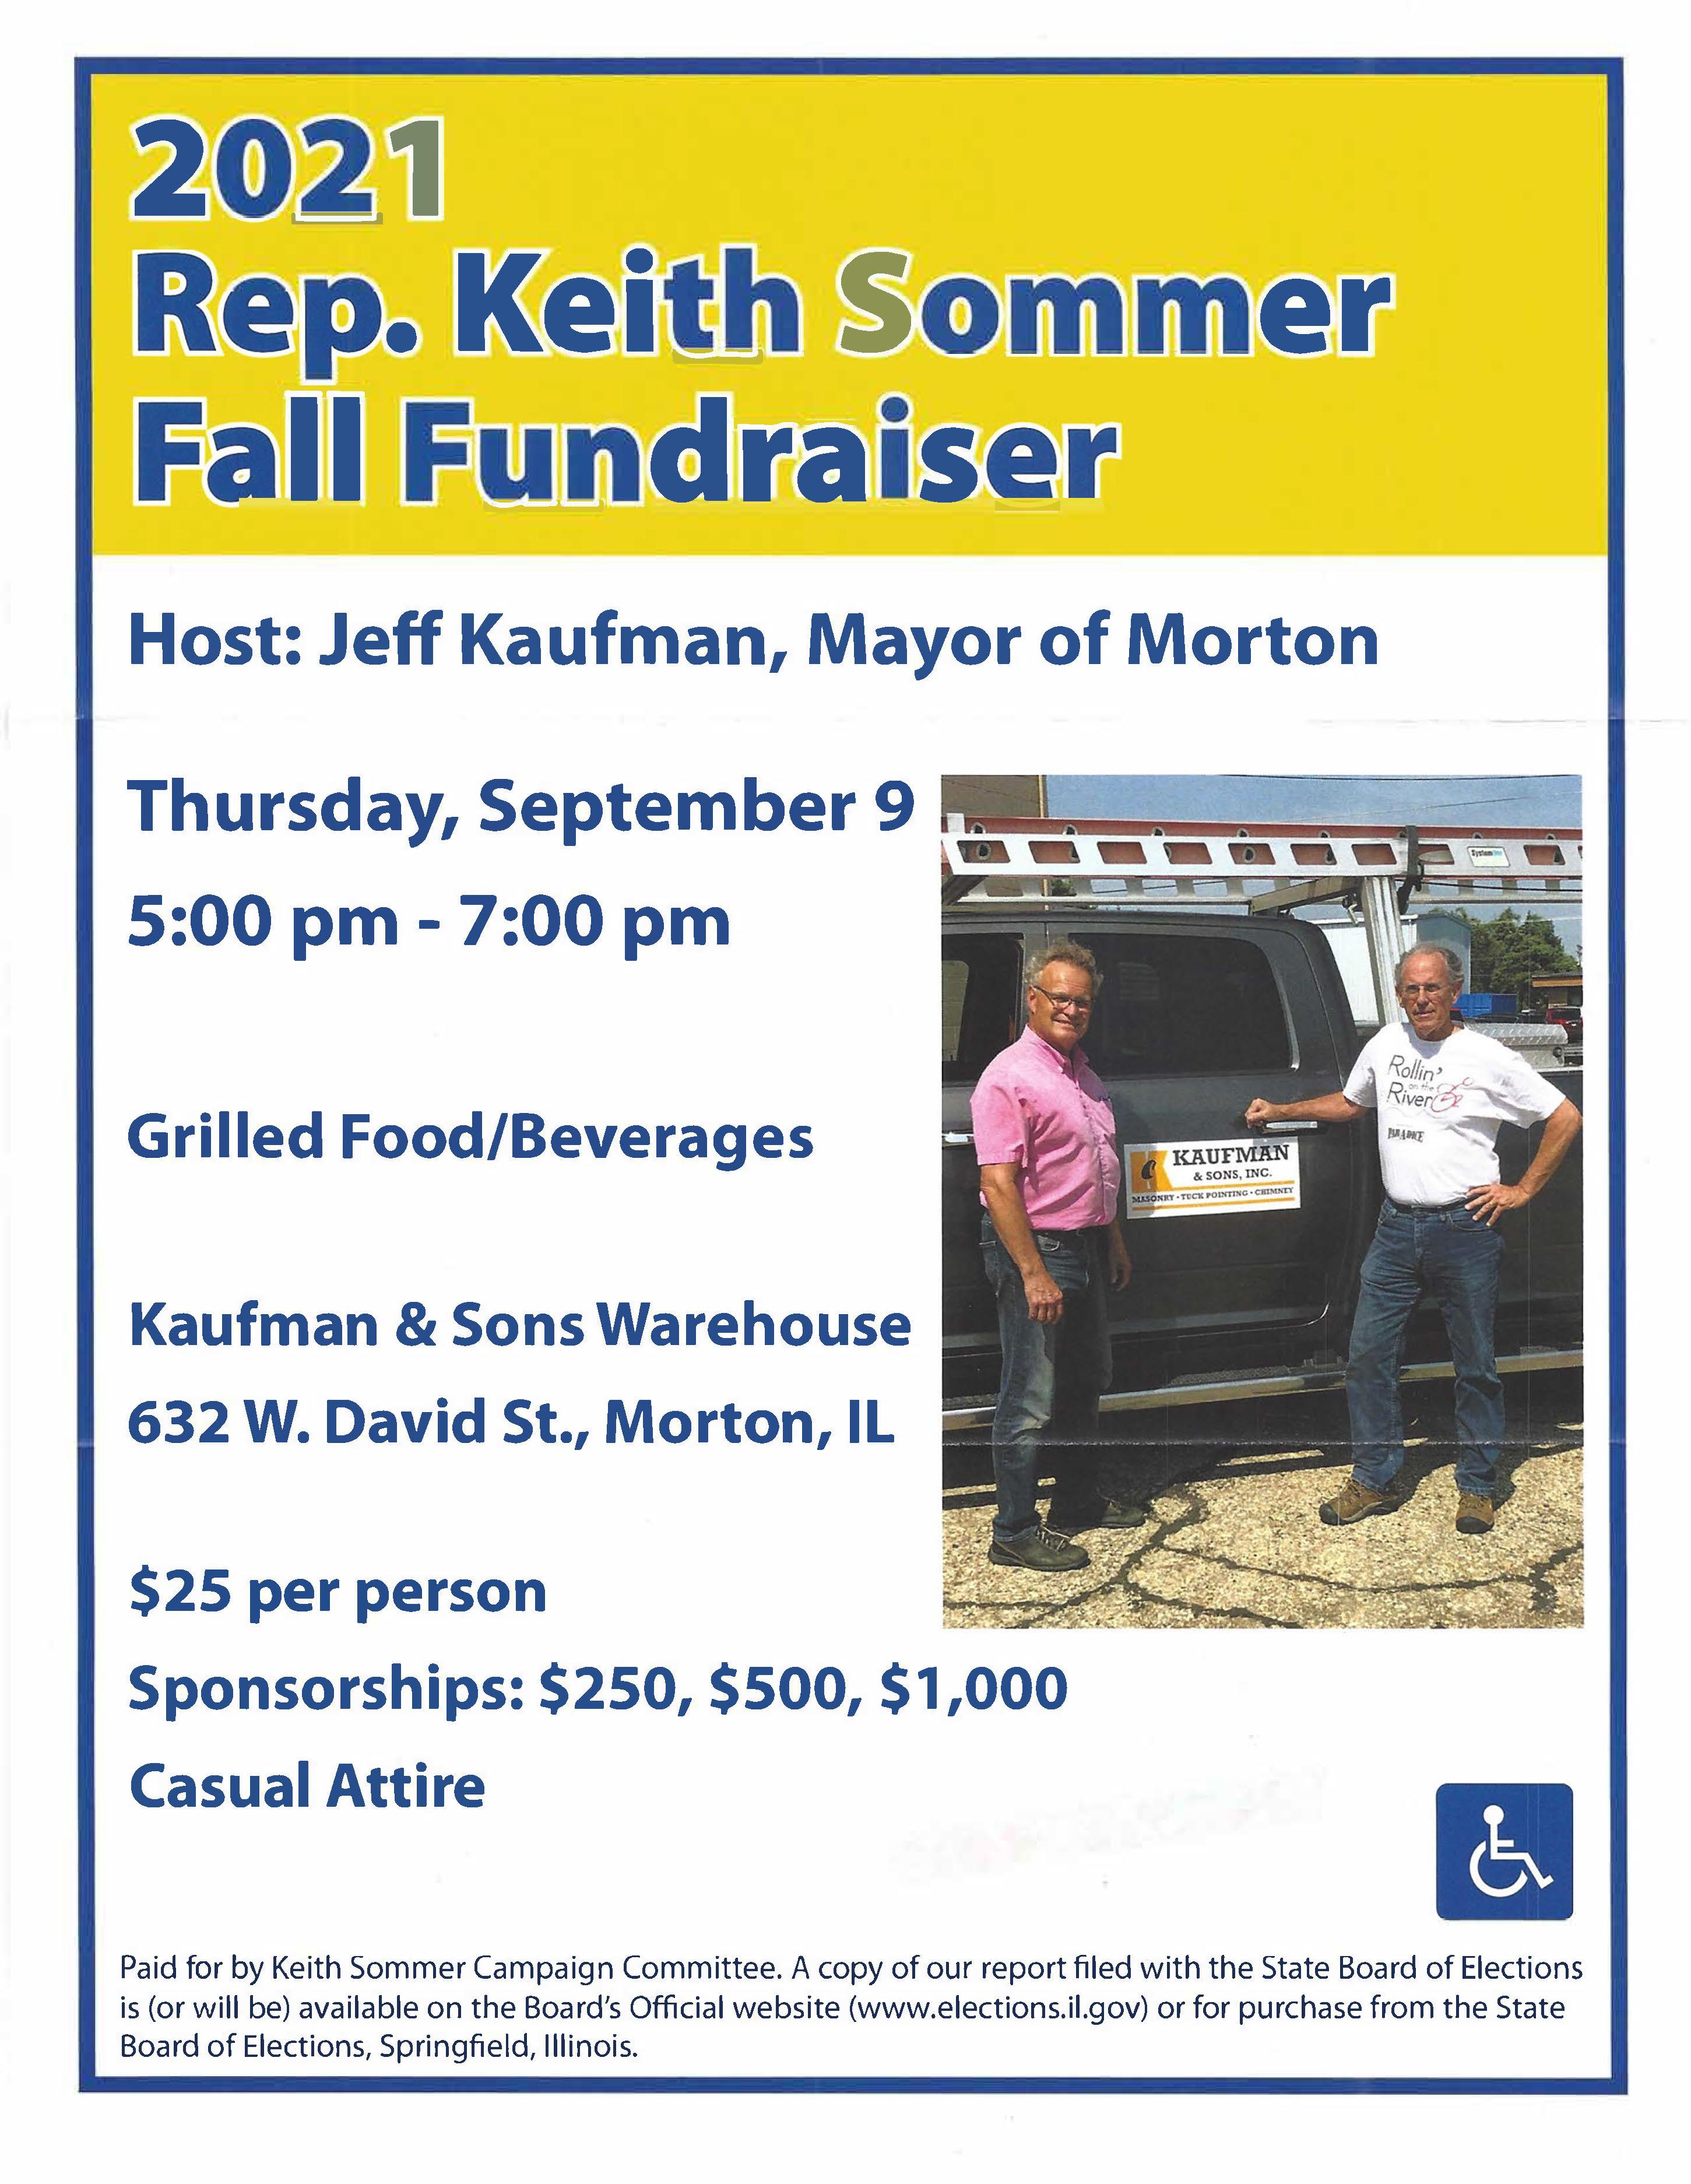 Keith Sommer Fall Fundraiser